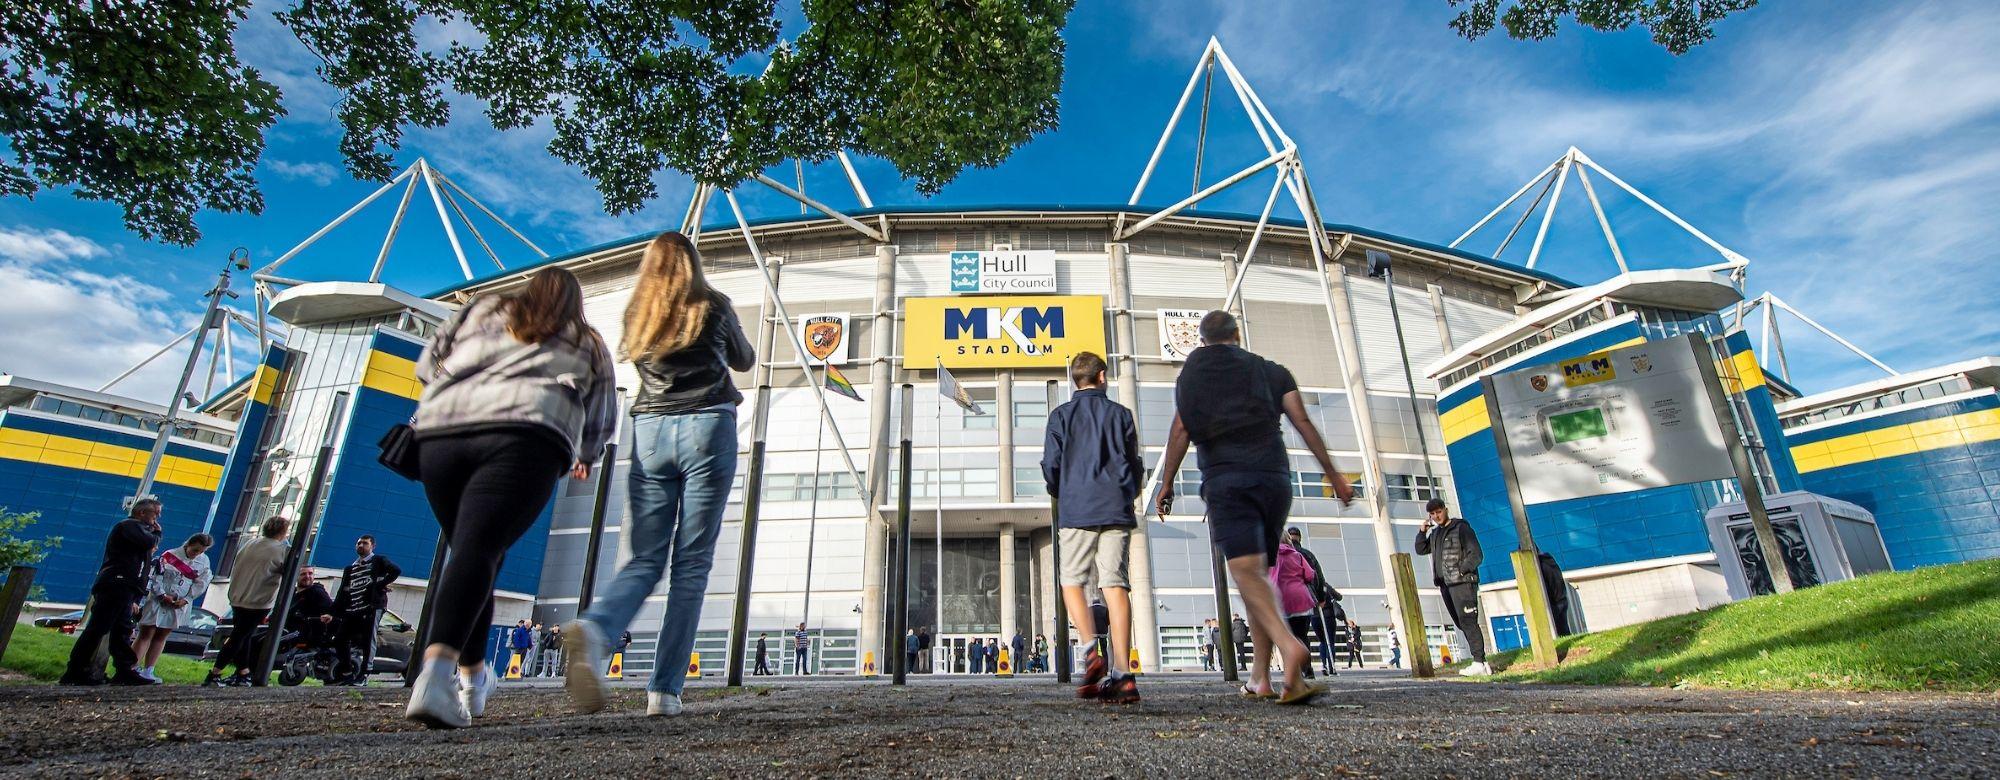 Match Day Info Guide: Hull FC vs Wigan